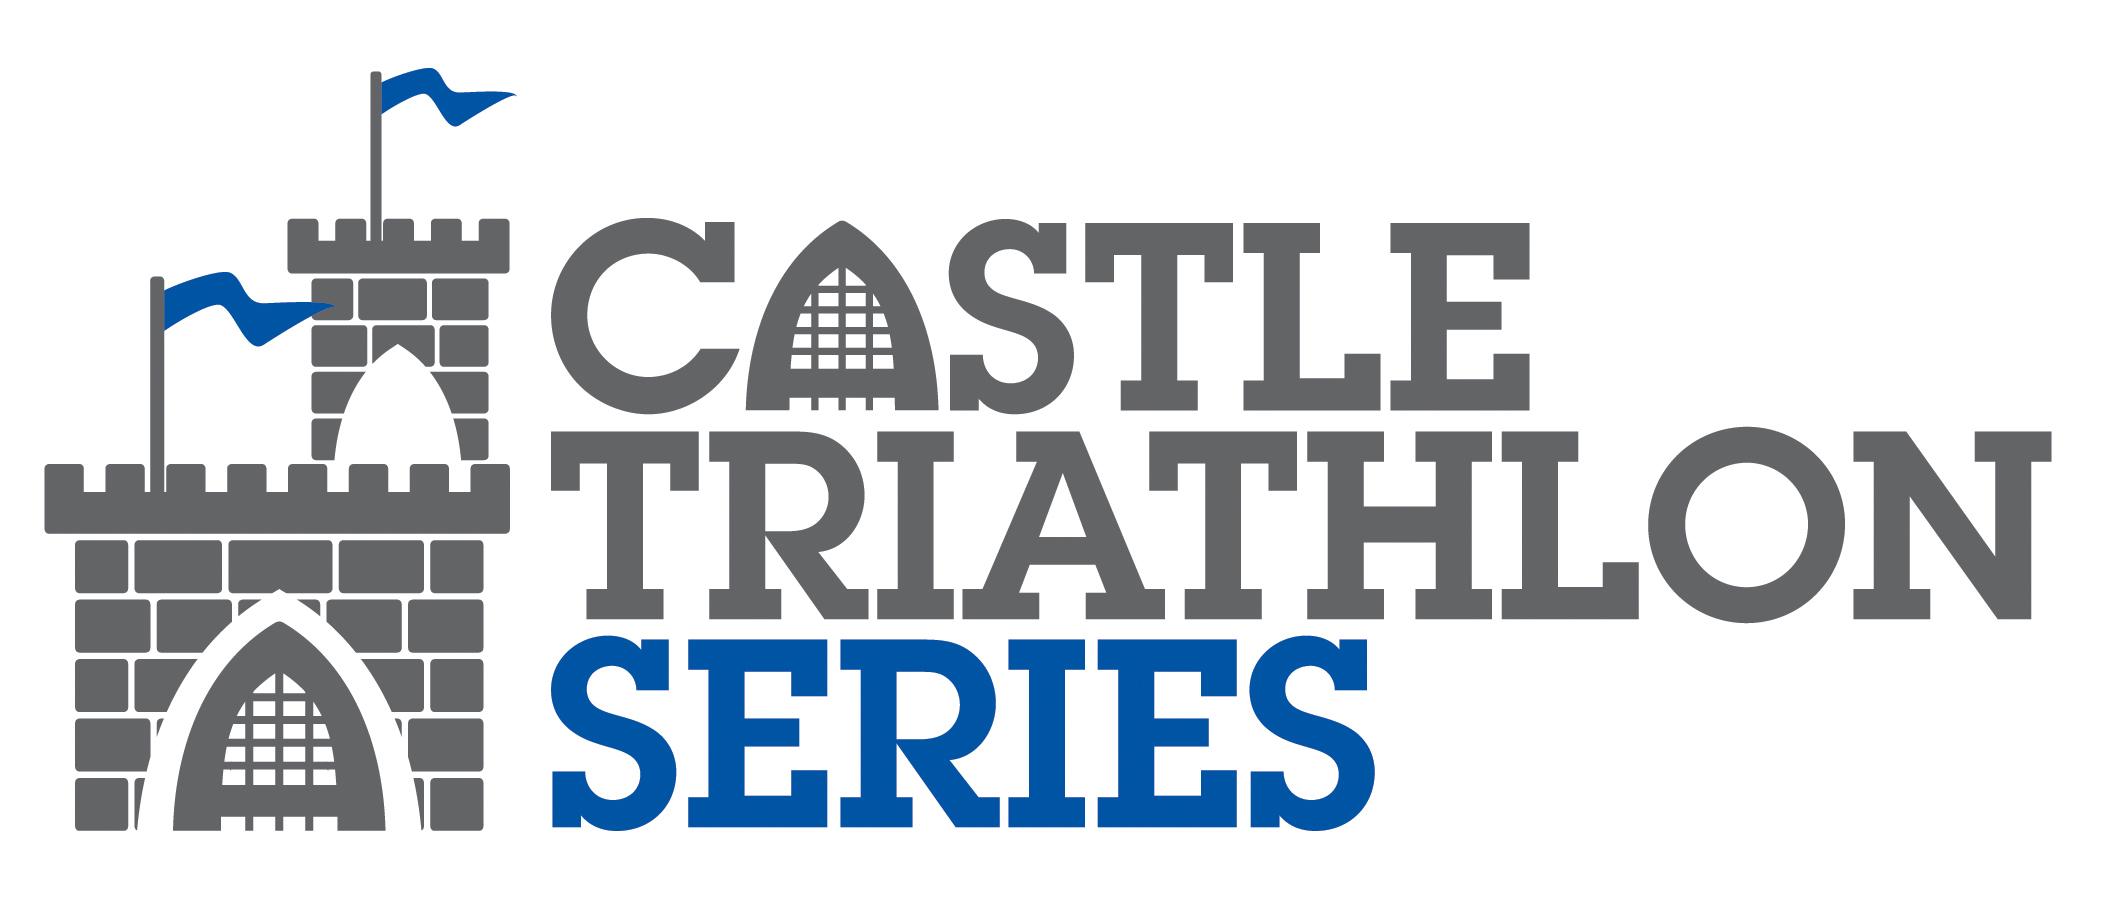 Cholmondeley Castle Triathlon 2021